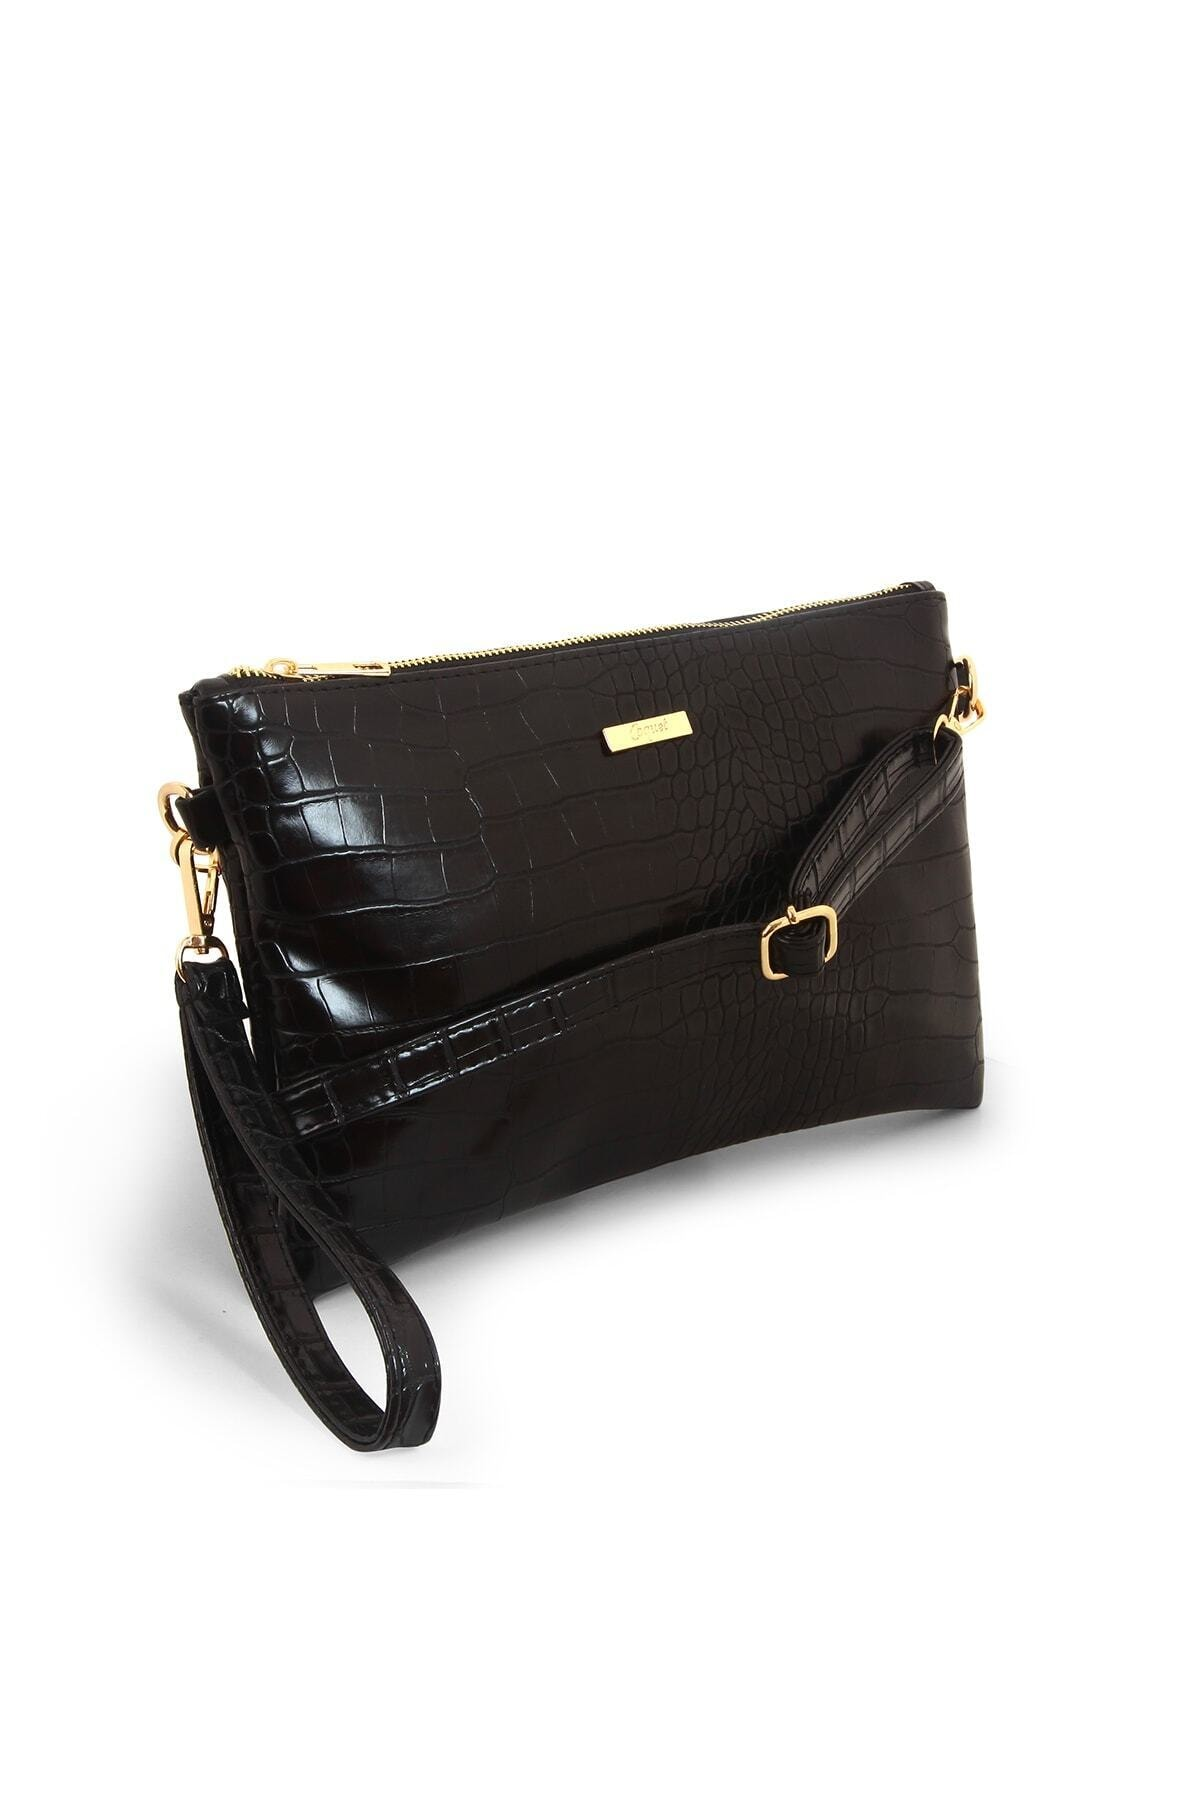 Coquet Accessories Kadın Siyah Pearly Clutch Çanta-19g3u13n001 2